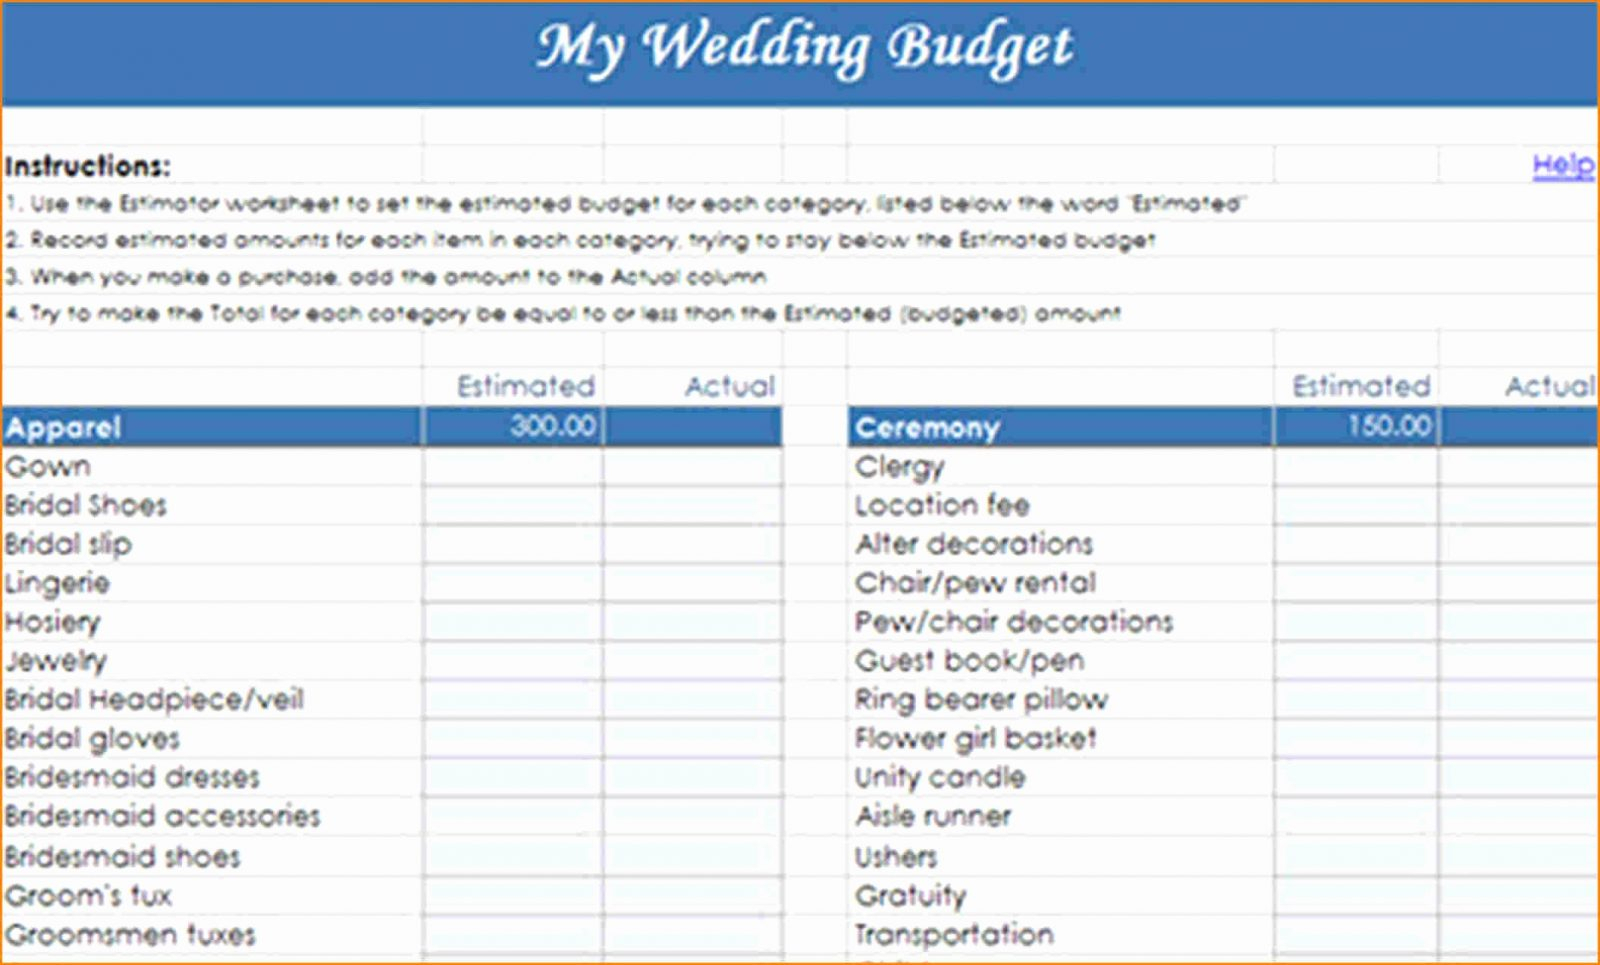 How To Make A Wedding Budget Spreadsheet